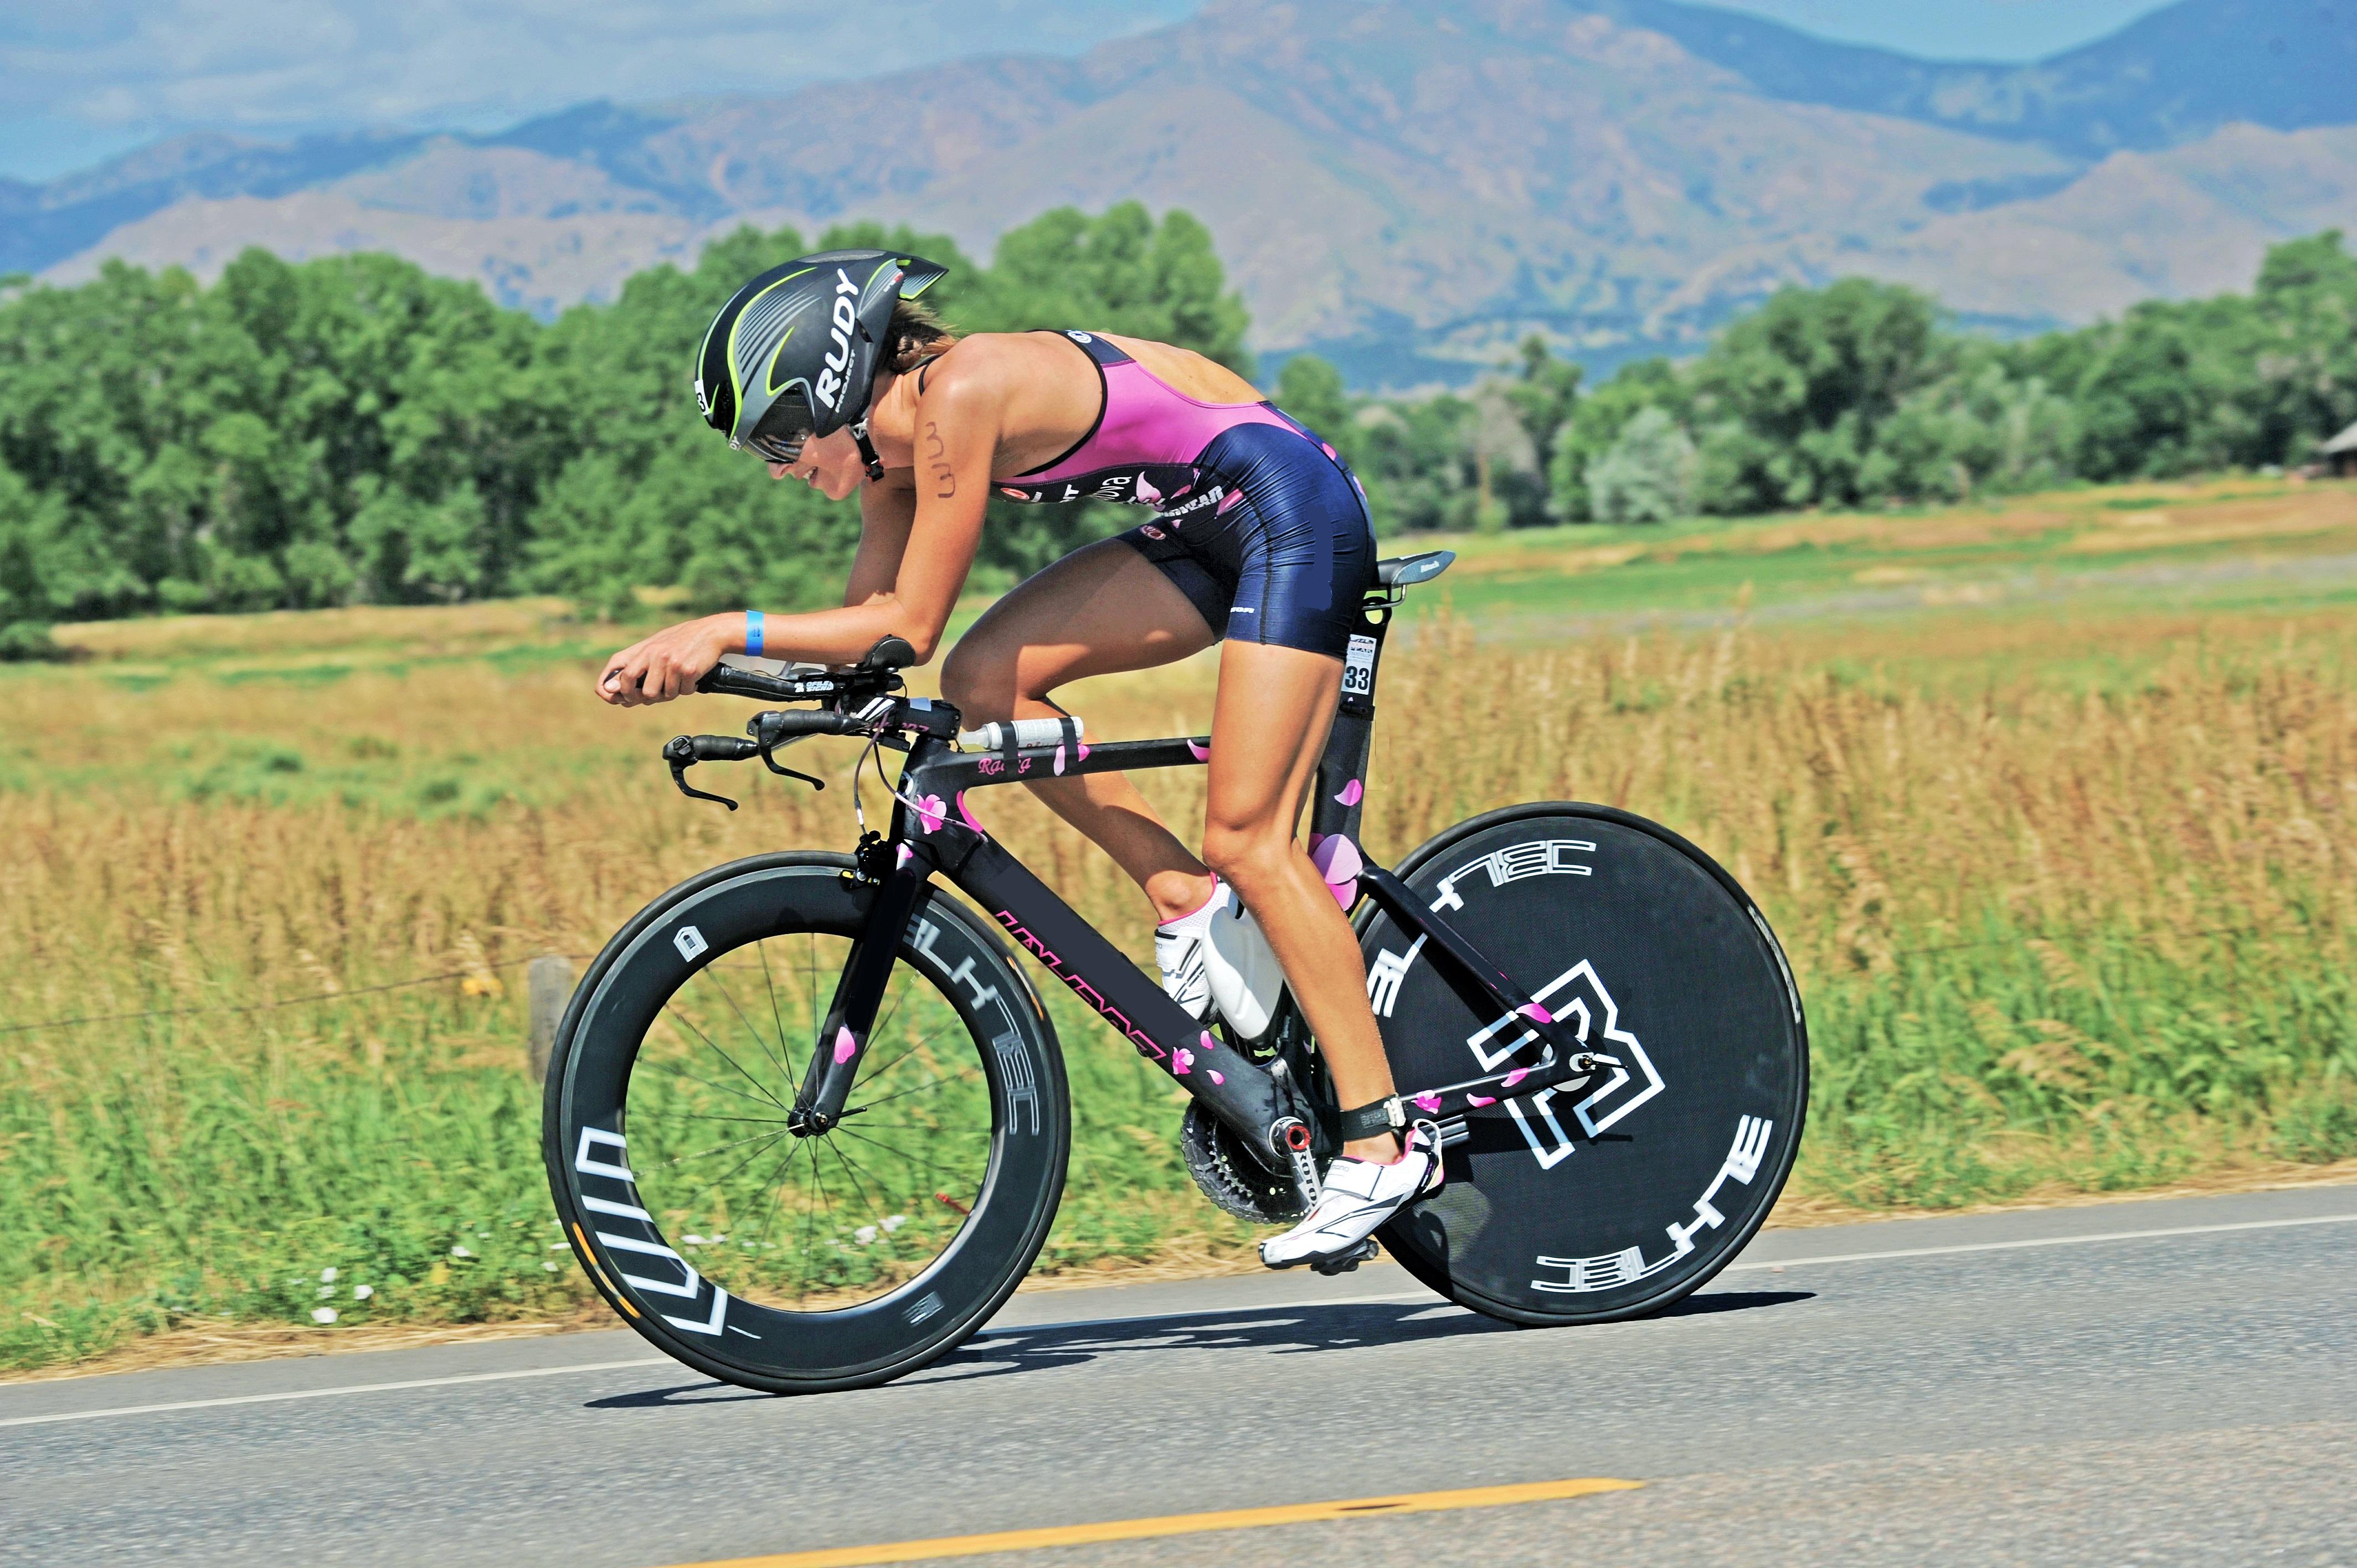 Radka Vodickova bikes Boulder Peak DSC_6510 -edits.jpg